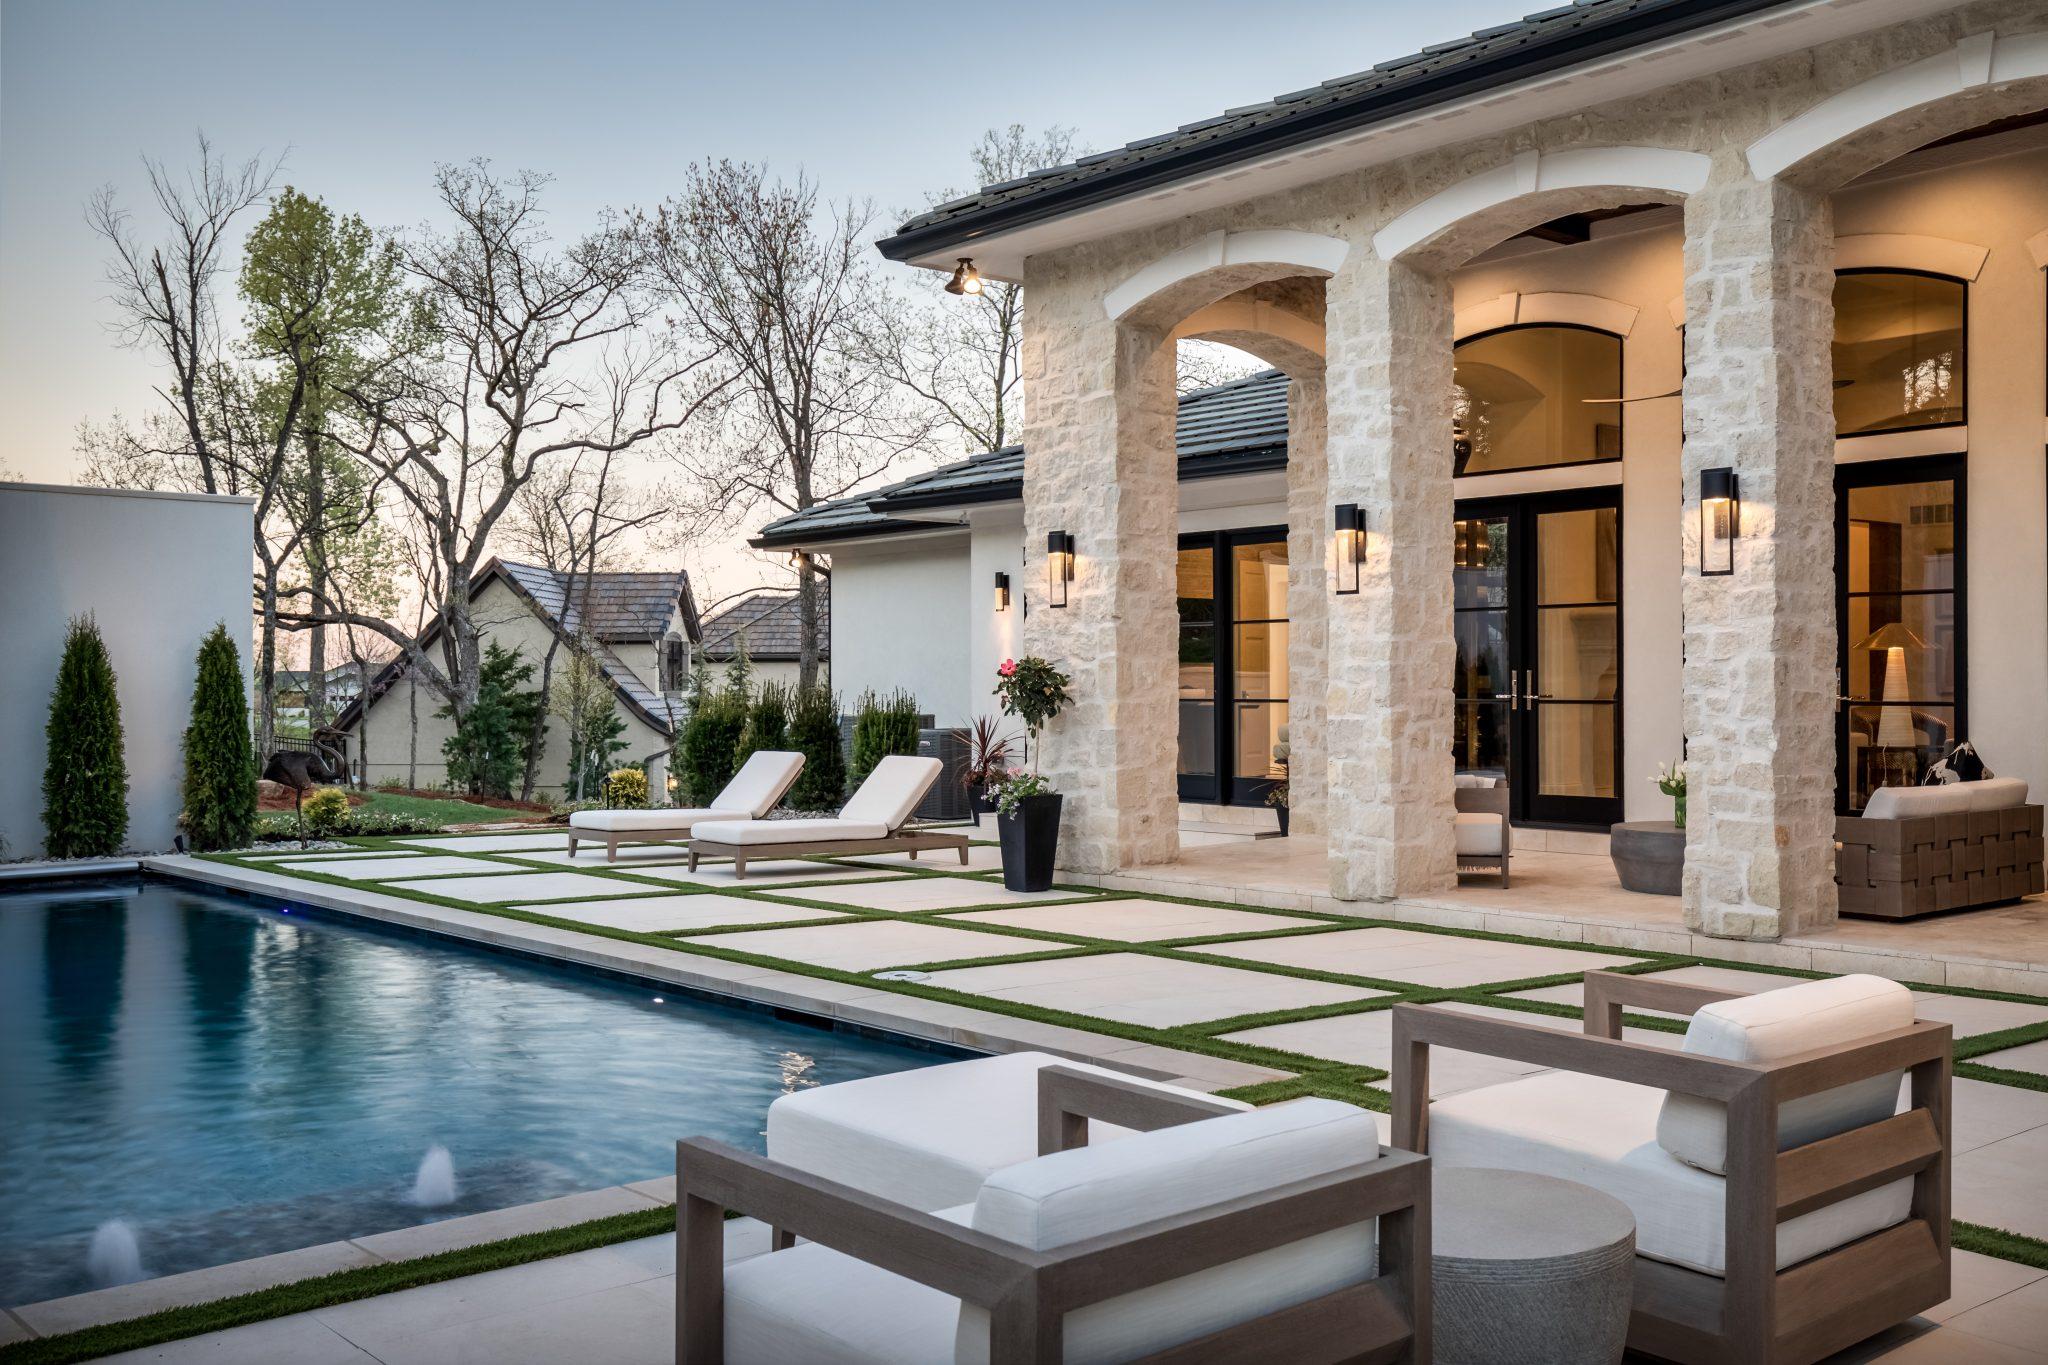 Custom built patio and pool